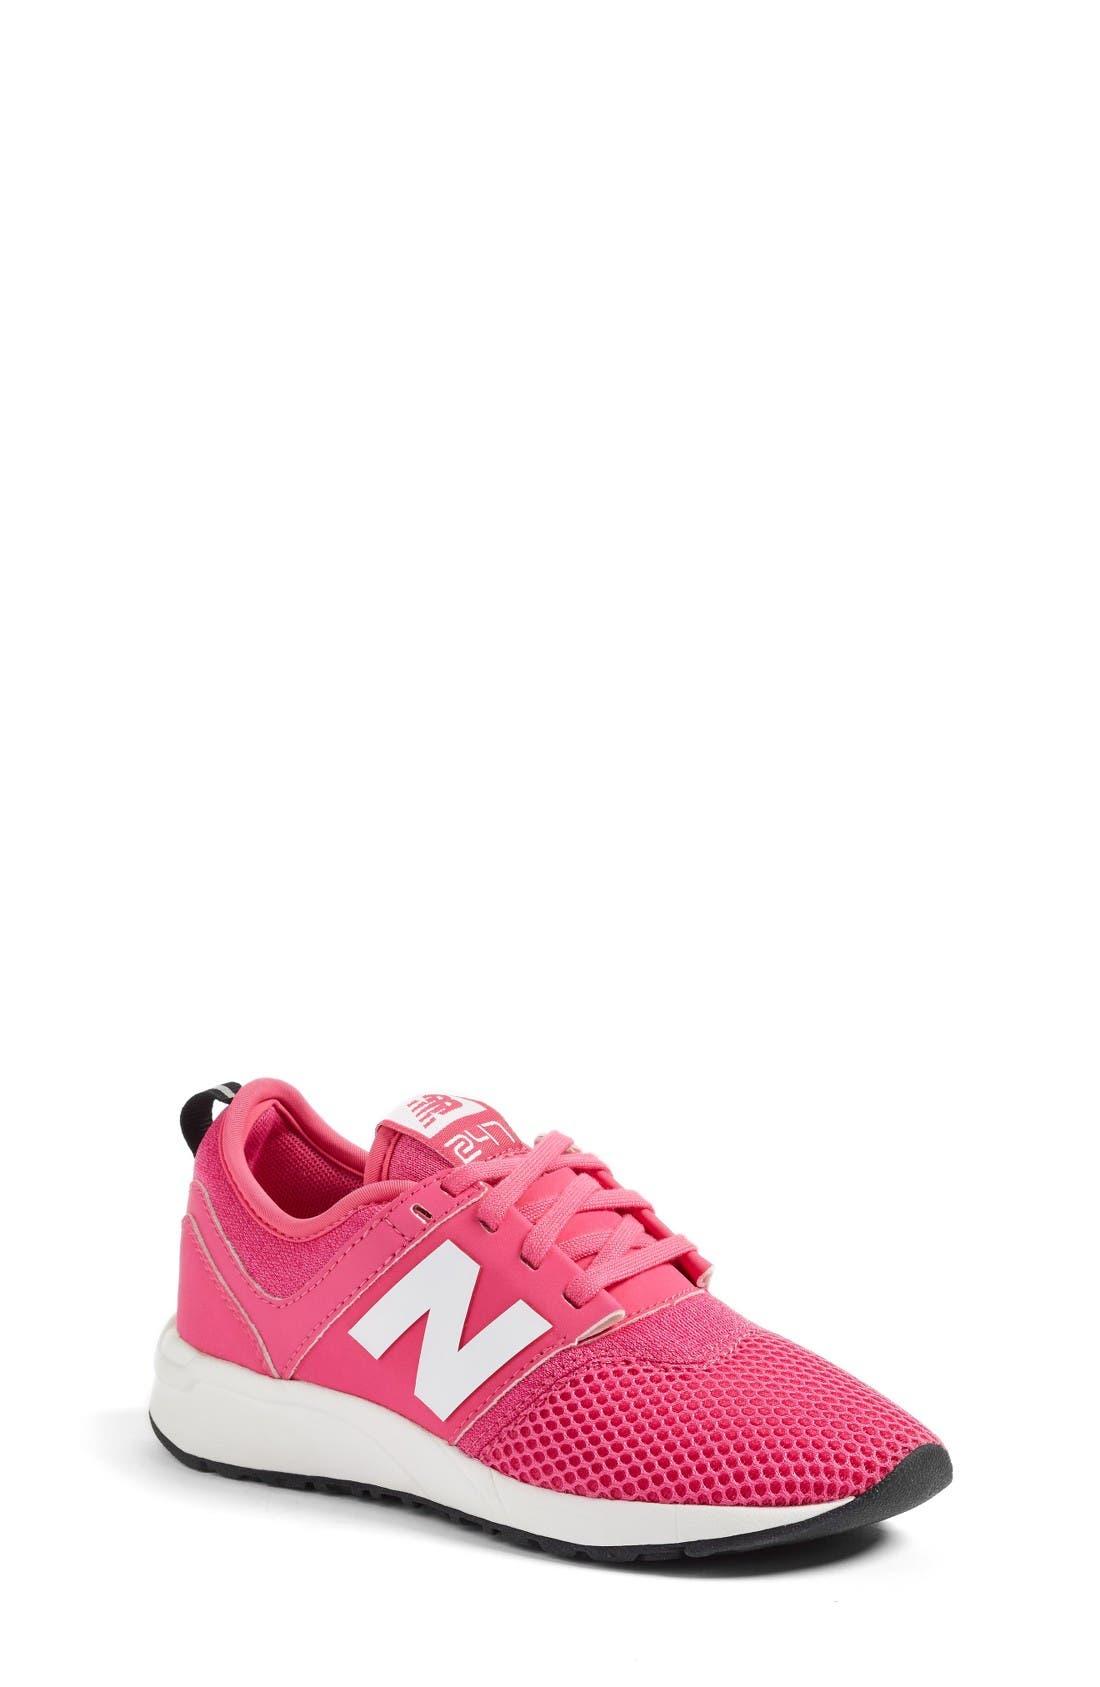 Main Image - New Balance 247 Sport Sneaker (Baby, Walker, Toddler, Little Kid & Big Kid)